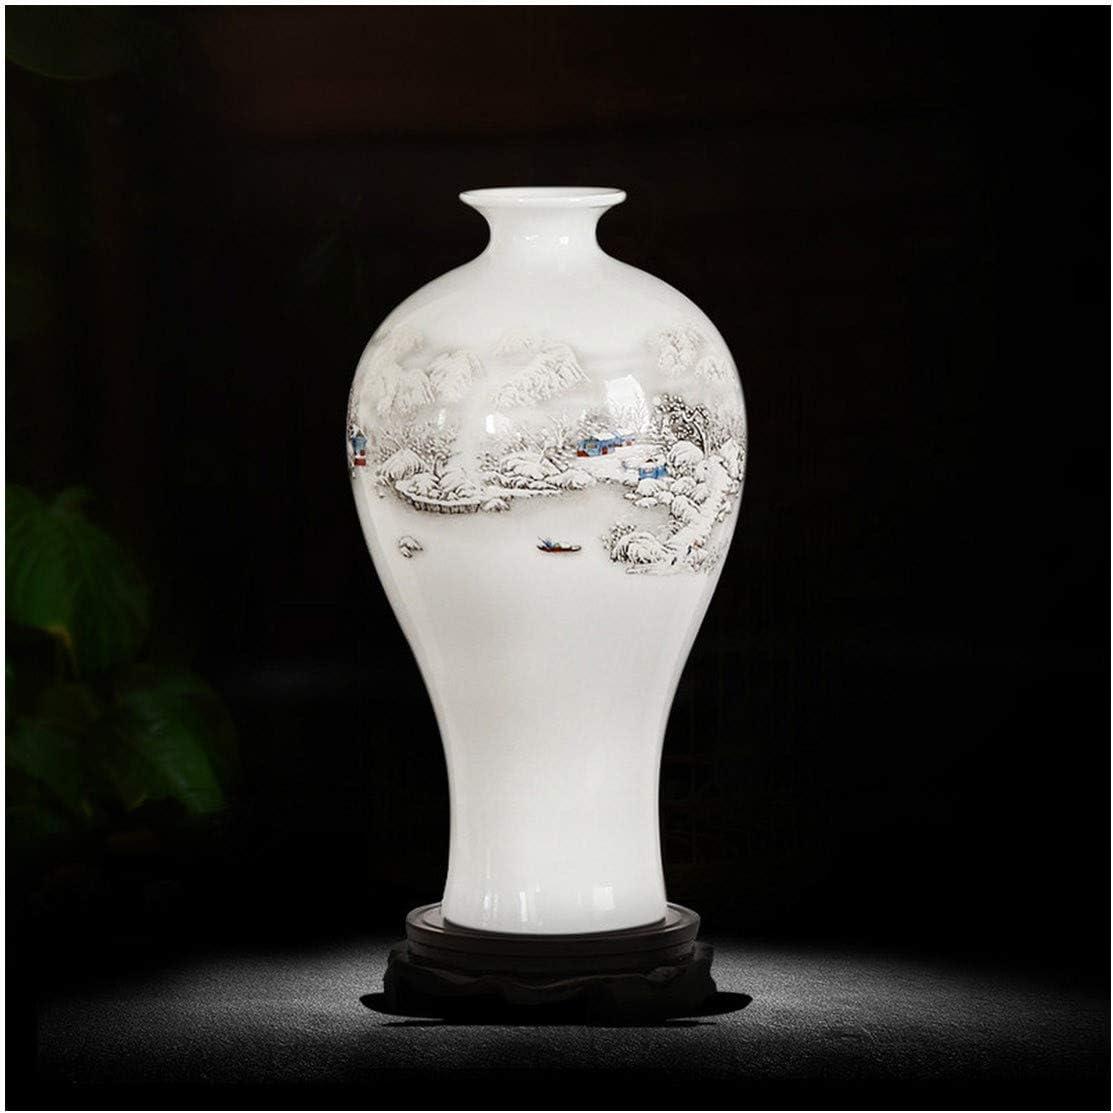 Amazon.com: xsacuikj White Ceramics Porcelain Vase Home Decoration